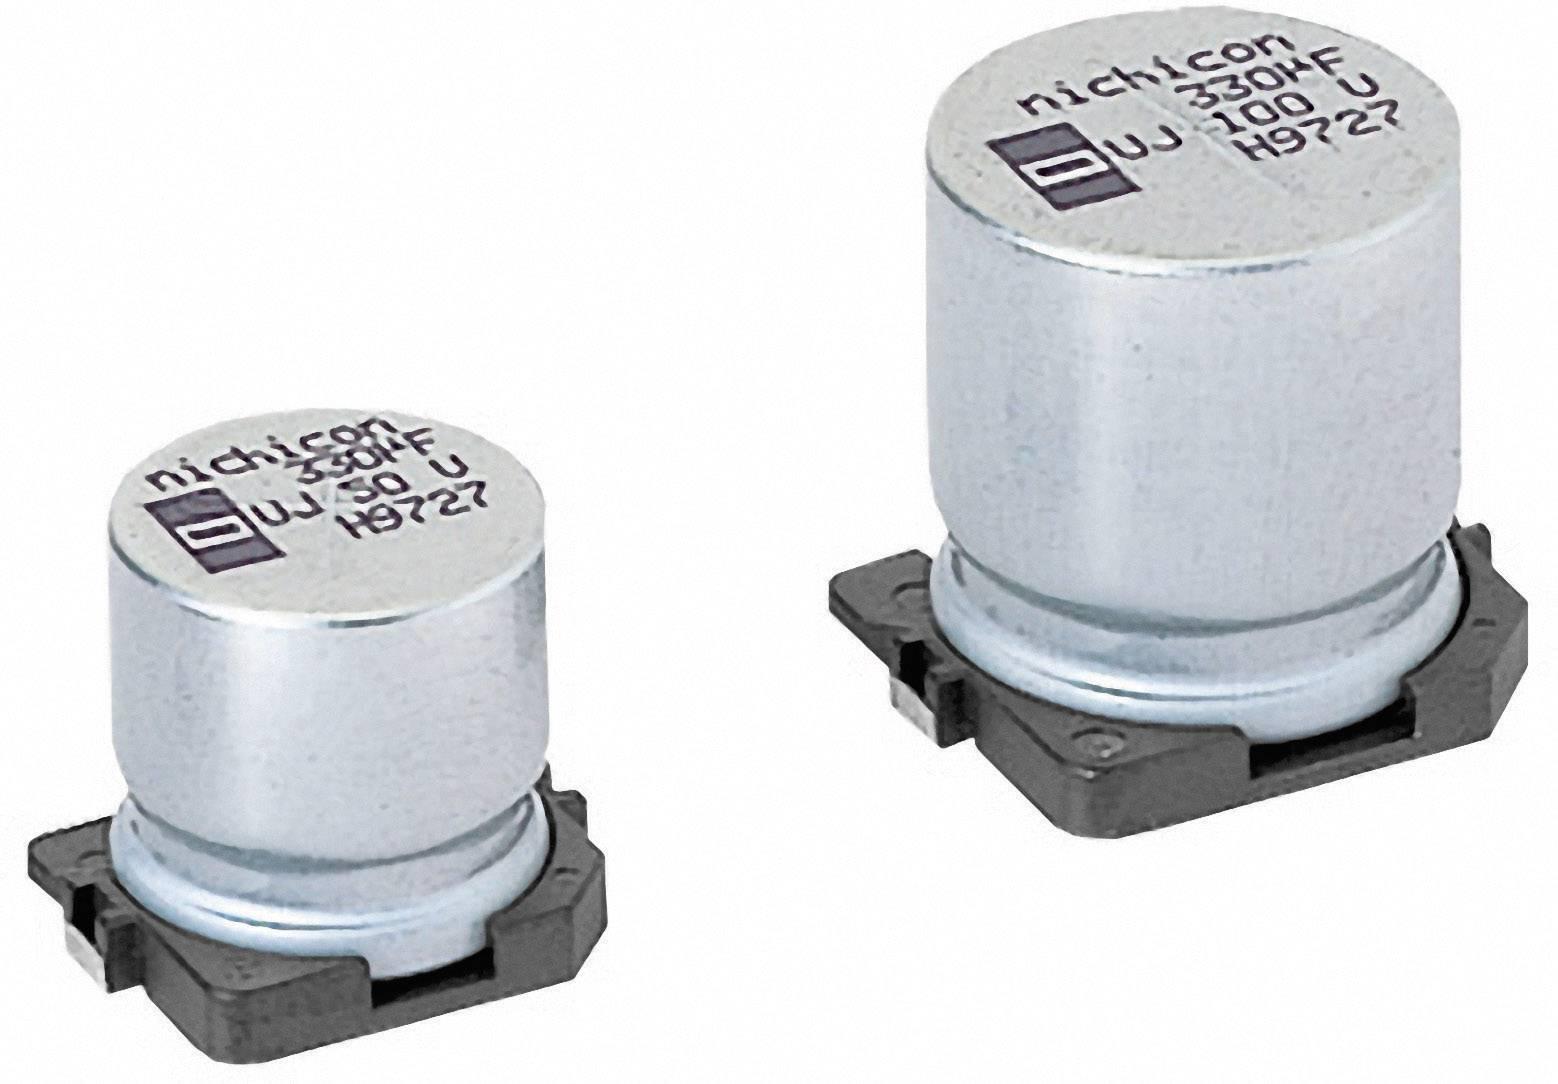 SMD kondenzátor elektrolytický Nichicon UWD0J680MCL1GS, 68 mF, 6,3 V, 20 %, 5,8 x 6,3